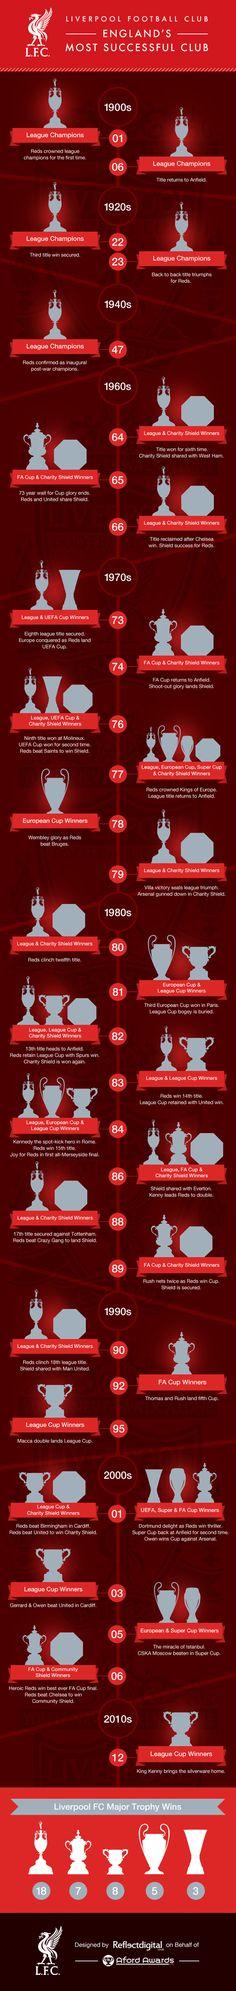 History of #LiverpoolFootballClub #Trophies #lfc